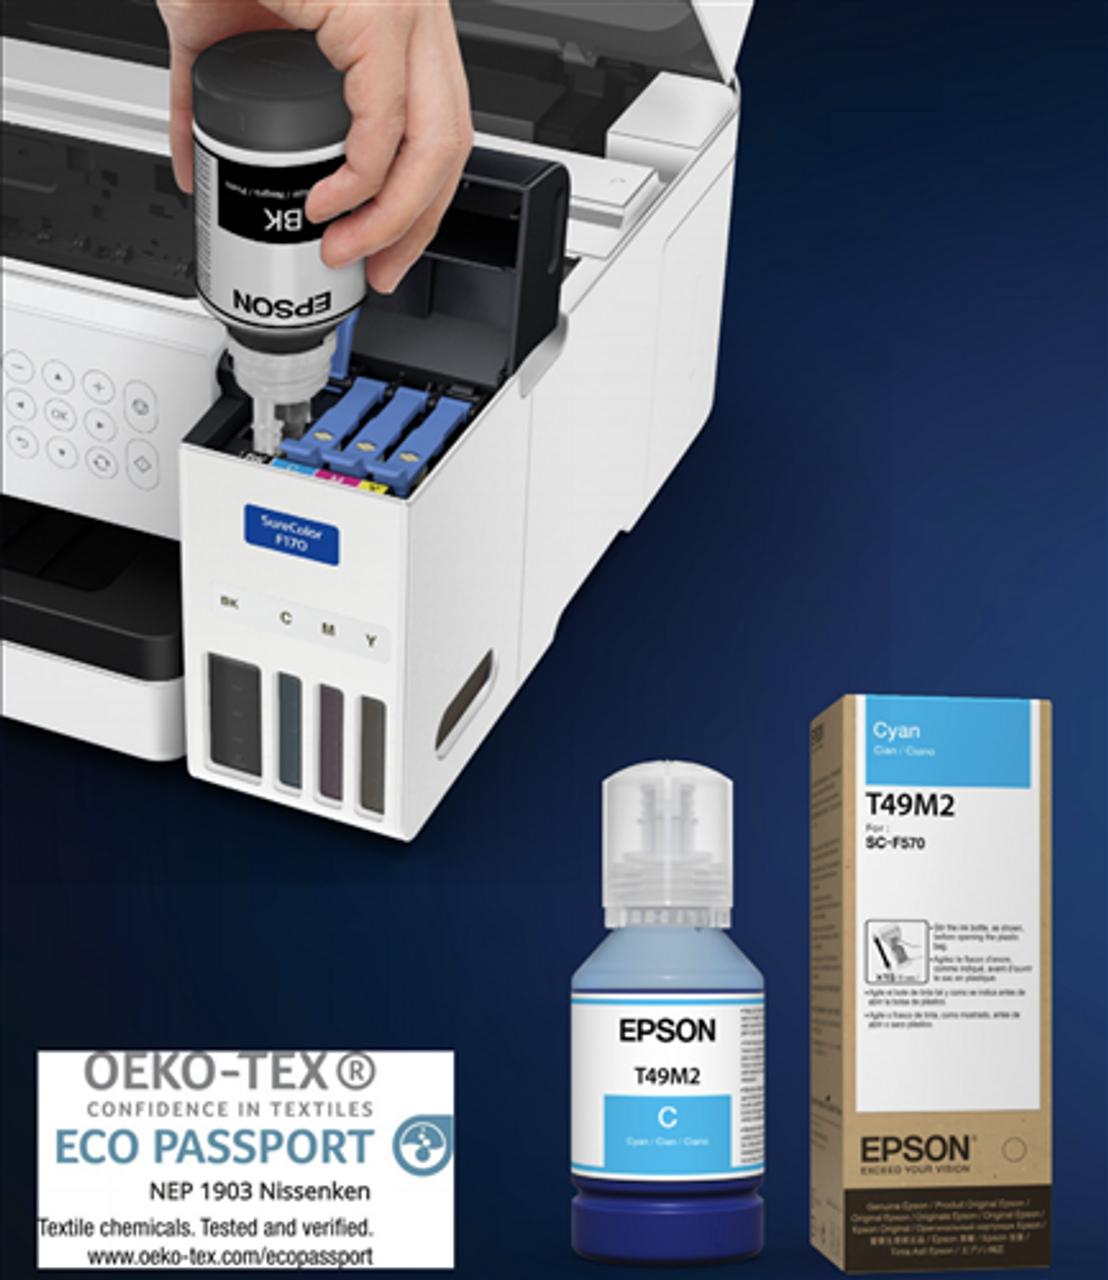 Epson SC-F170